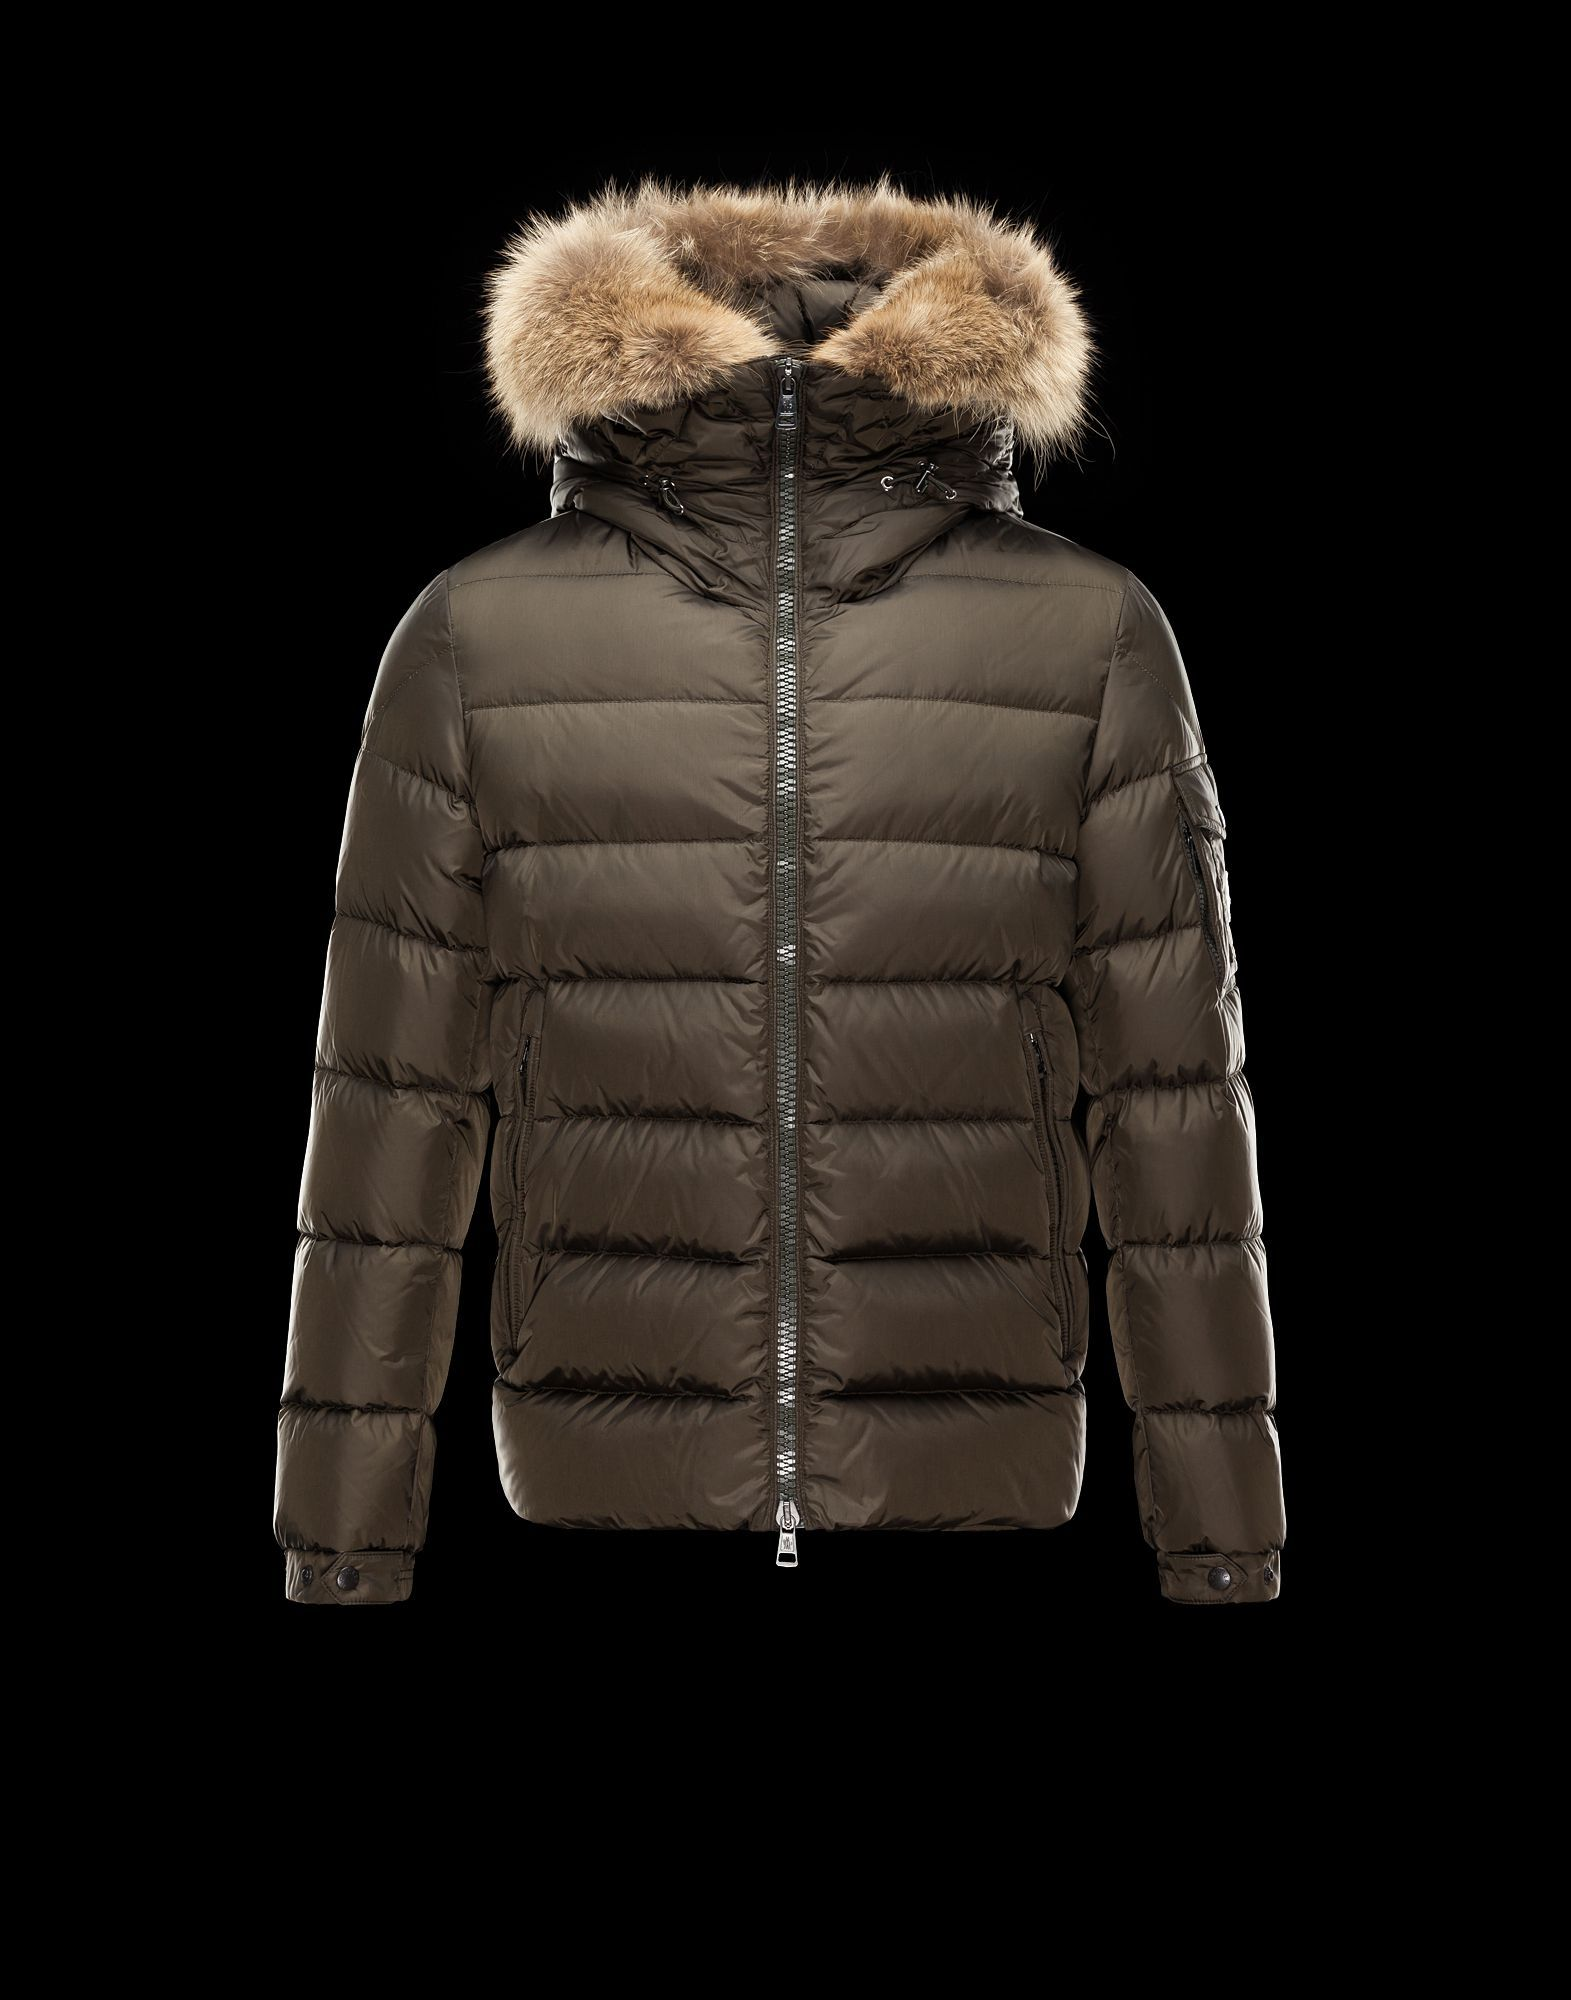 Jacket Men Outerwear Men on Moncler Online Store Mens